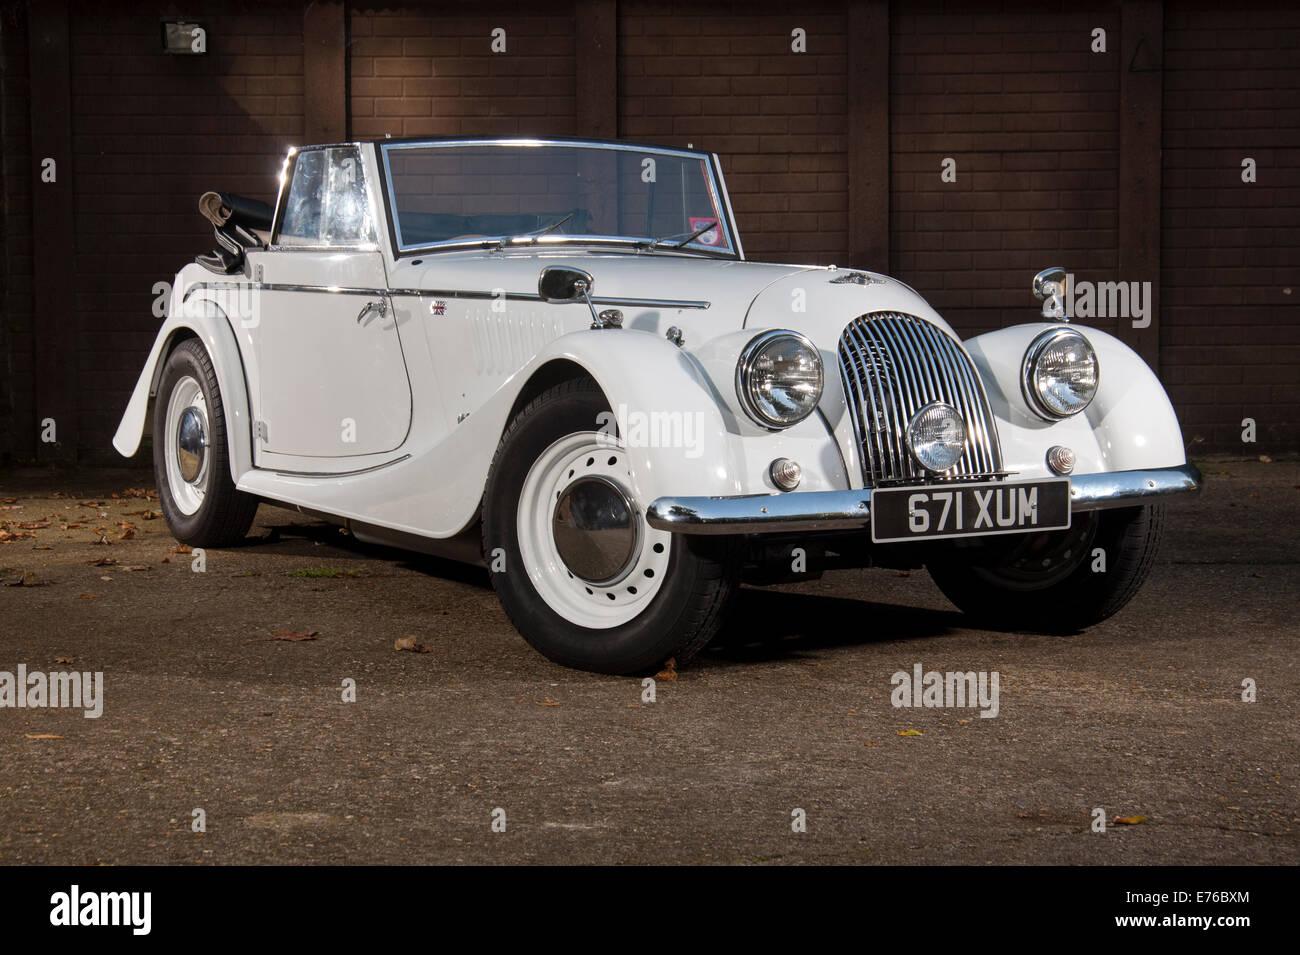 morgan plus 4 classic british sports car